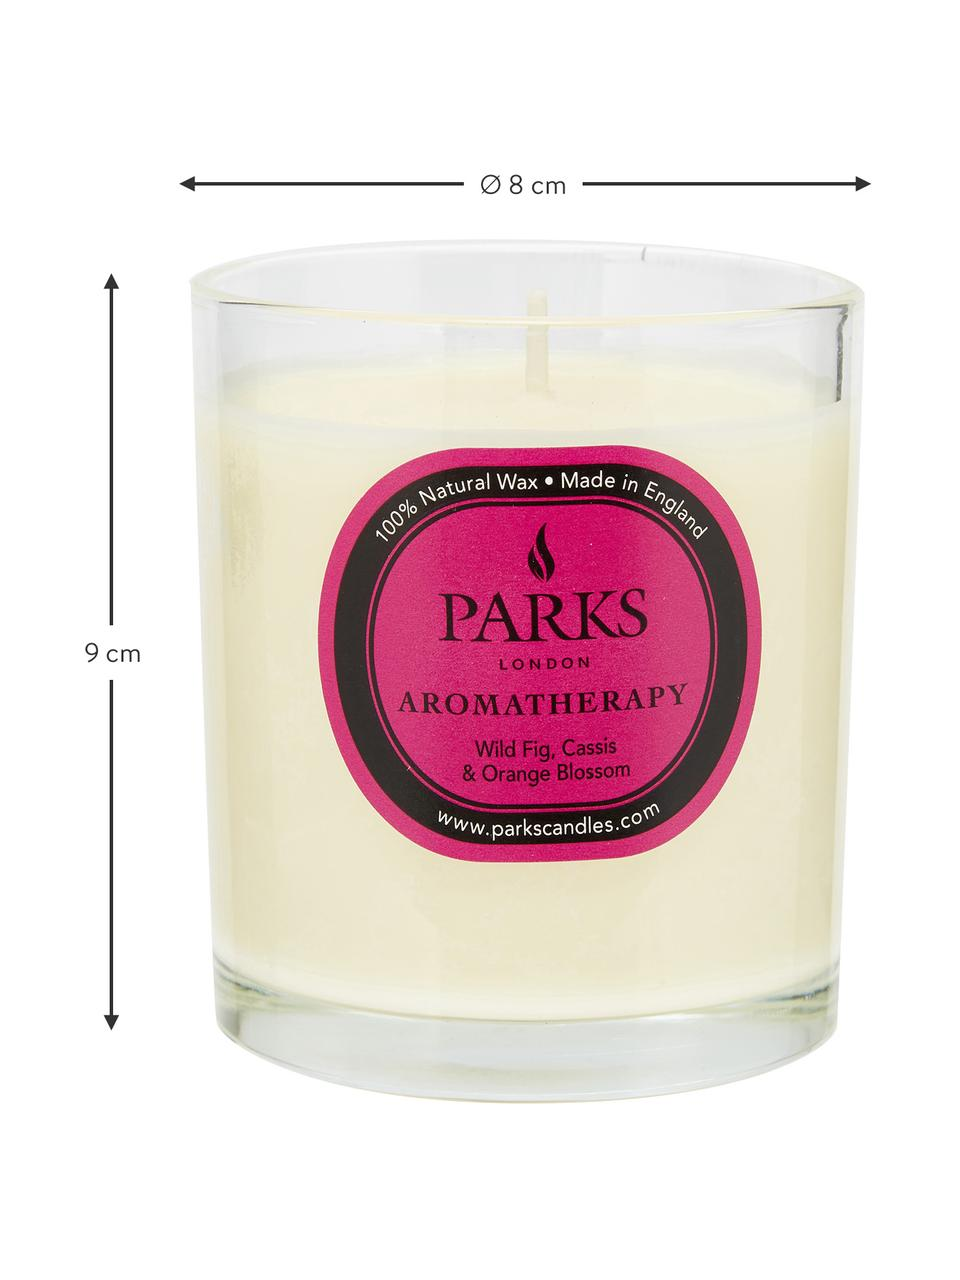 Duftkerze Aromatherapy (Feige, Cassis & Orange), Behälter: Glas, Feige, Cassis & Orange, Ø 8 x H 9 cm